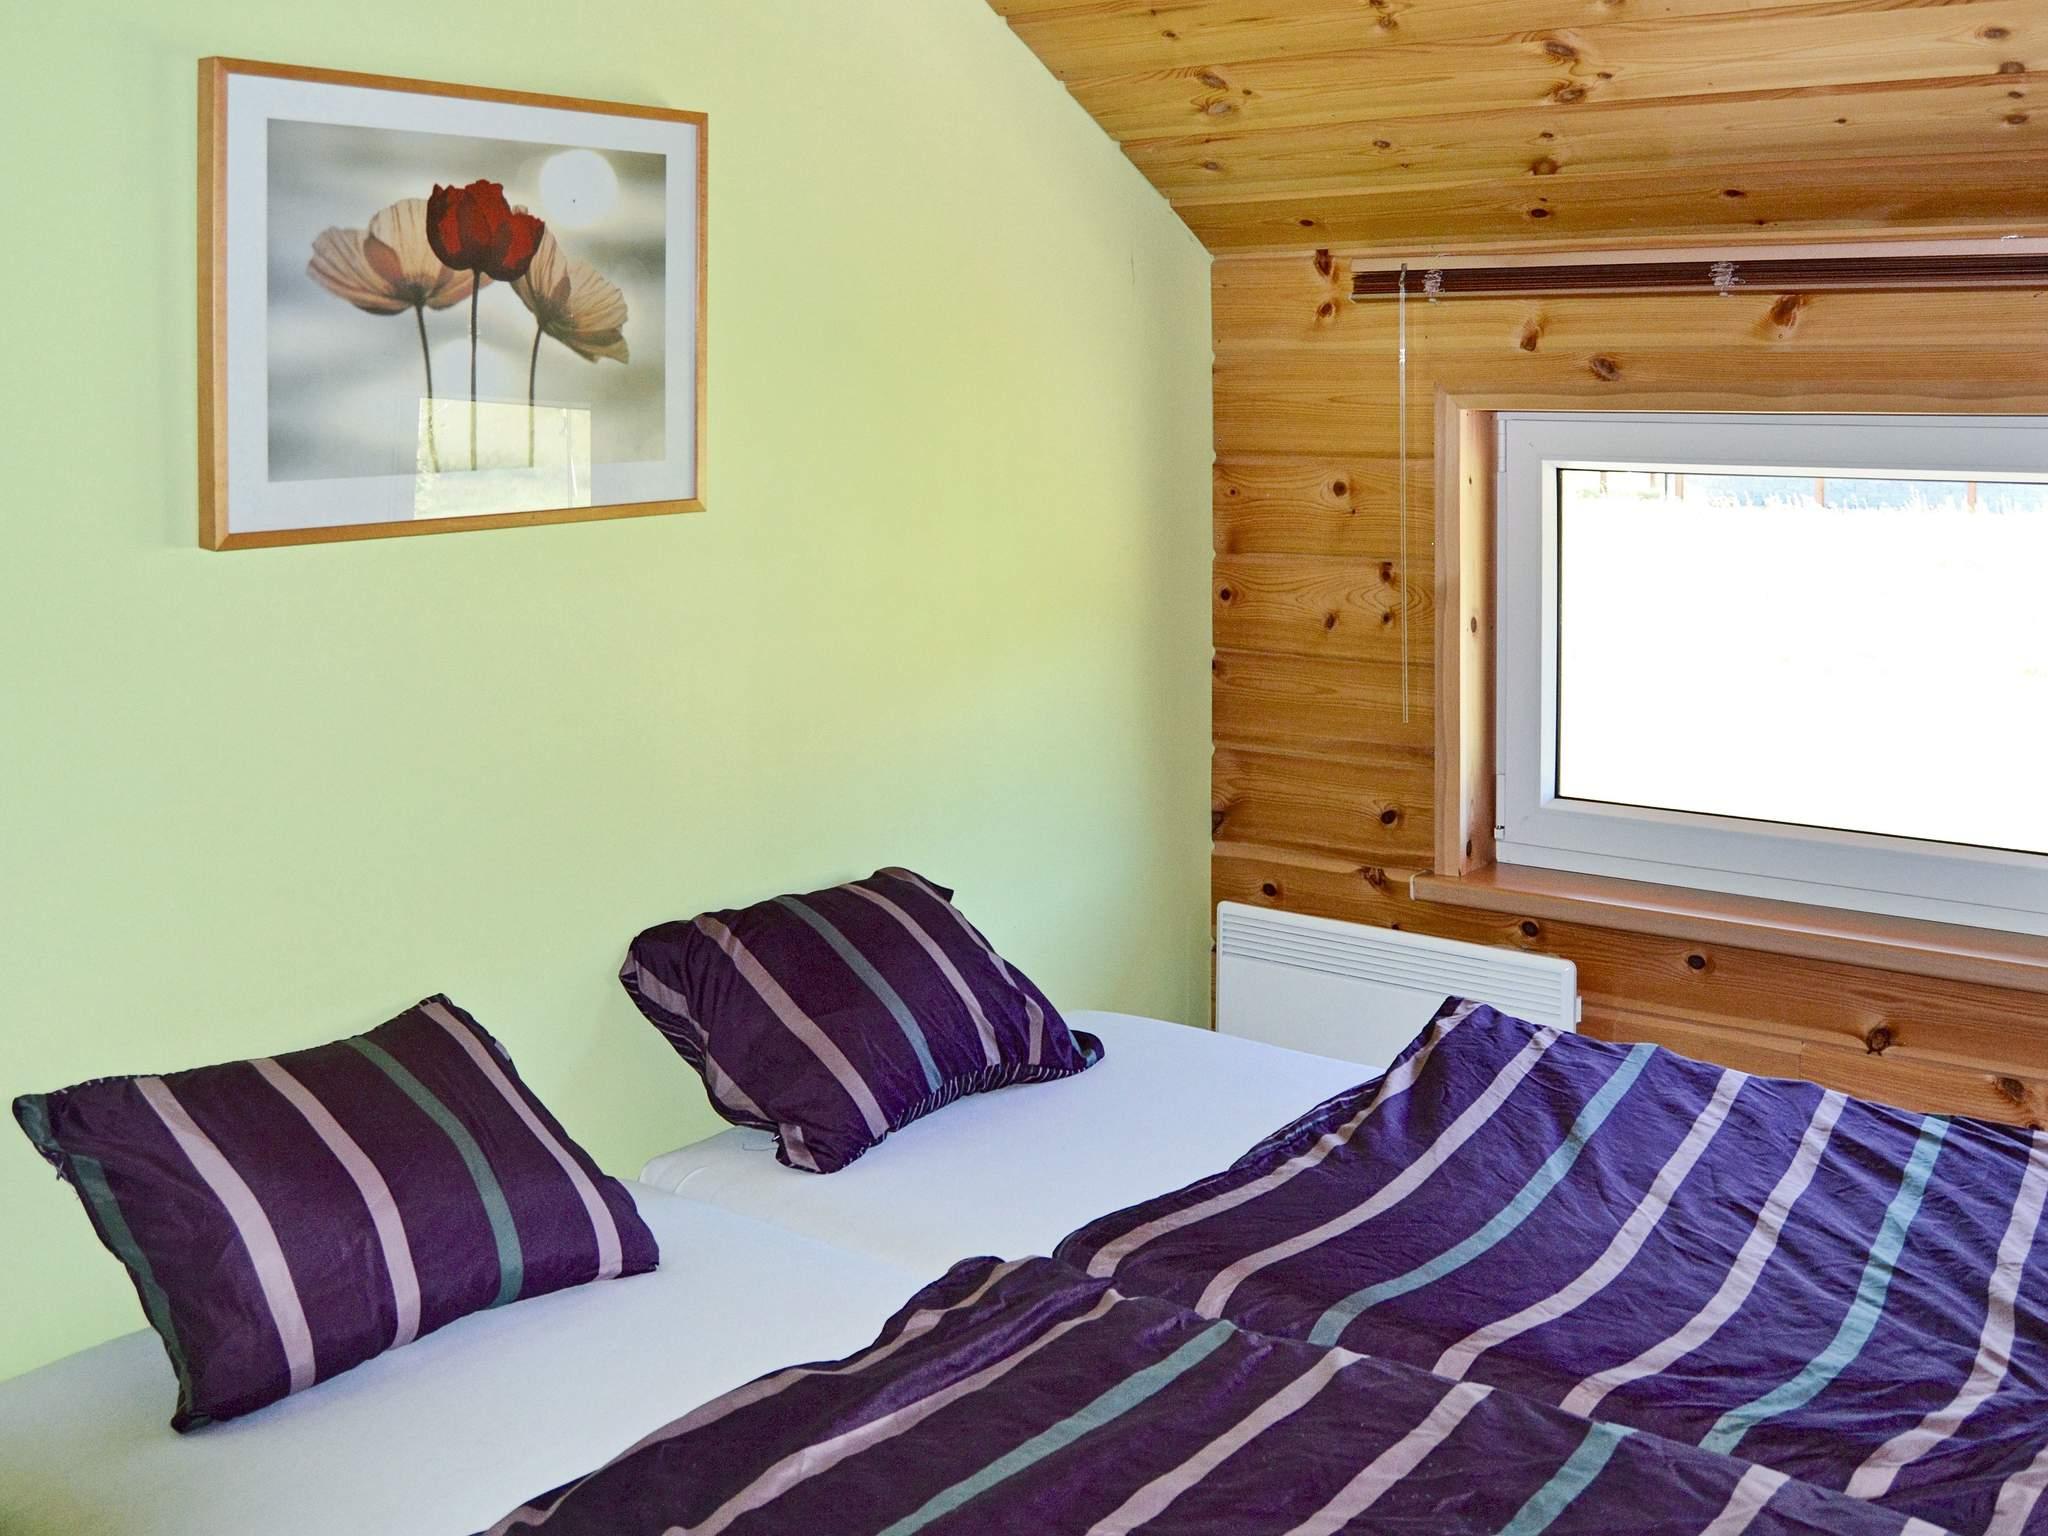 Ferienhaus Eidsvåg (135541), Eidsvåg, More - Romsdal, Westnorwegen, Norwegen, Bild 14